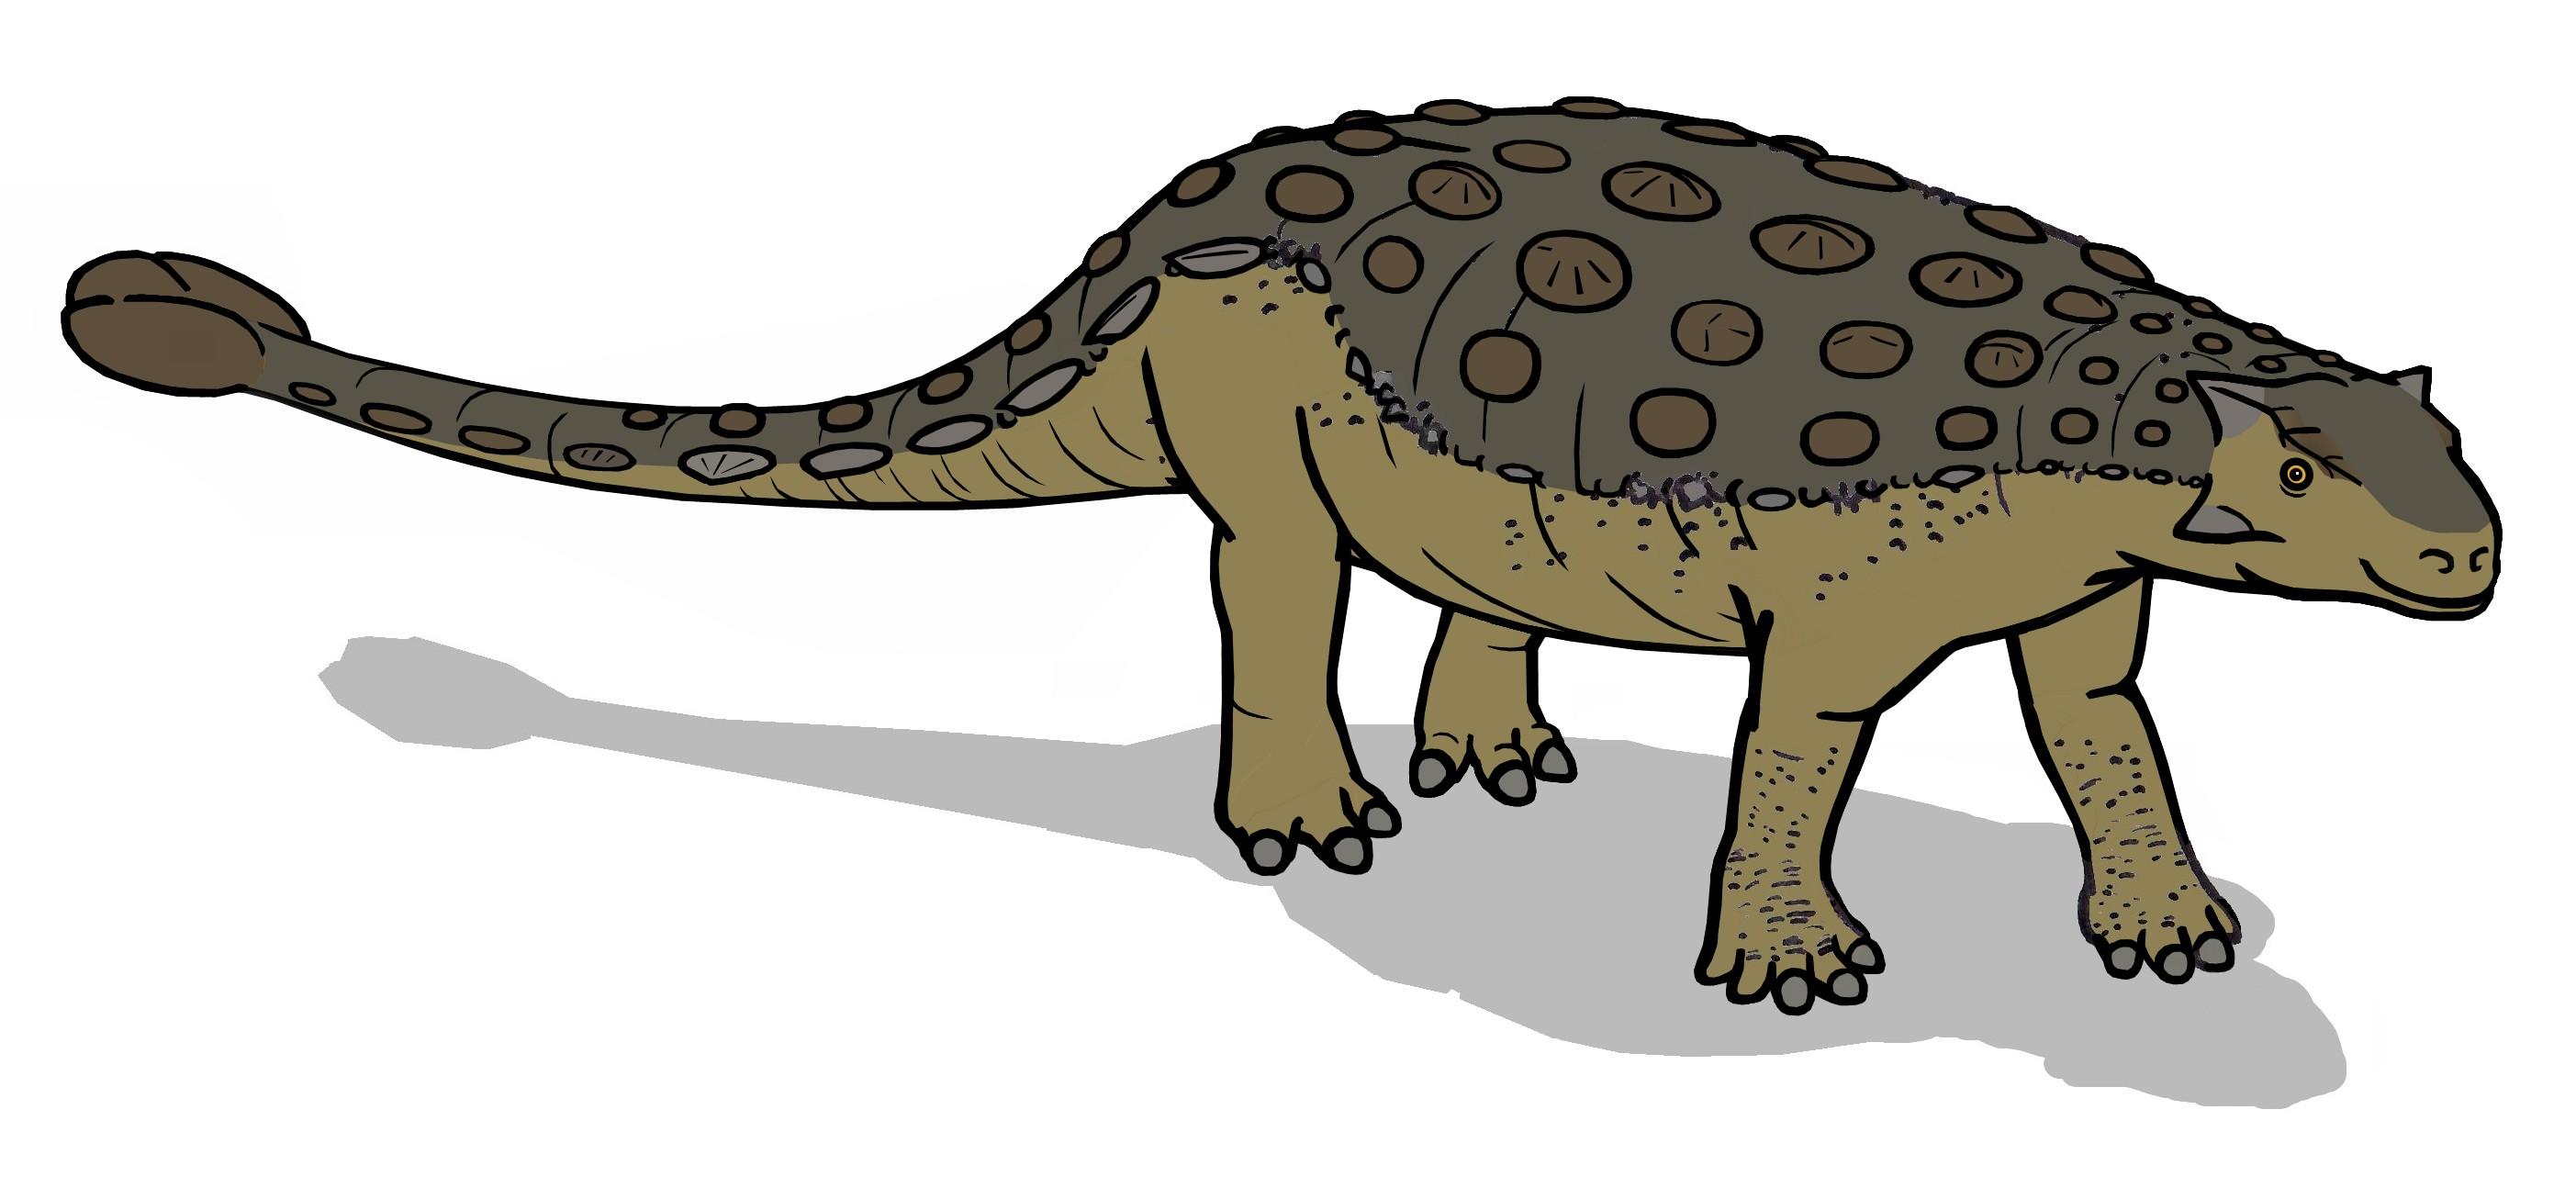 File:Tarchia 6497.JPG - Wikipedia, the free encyclopedia